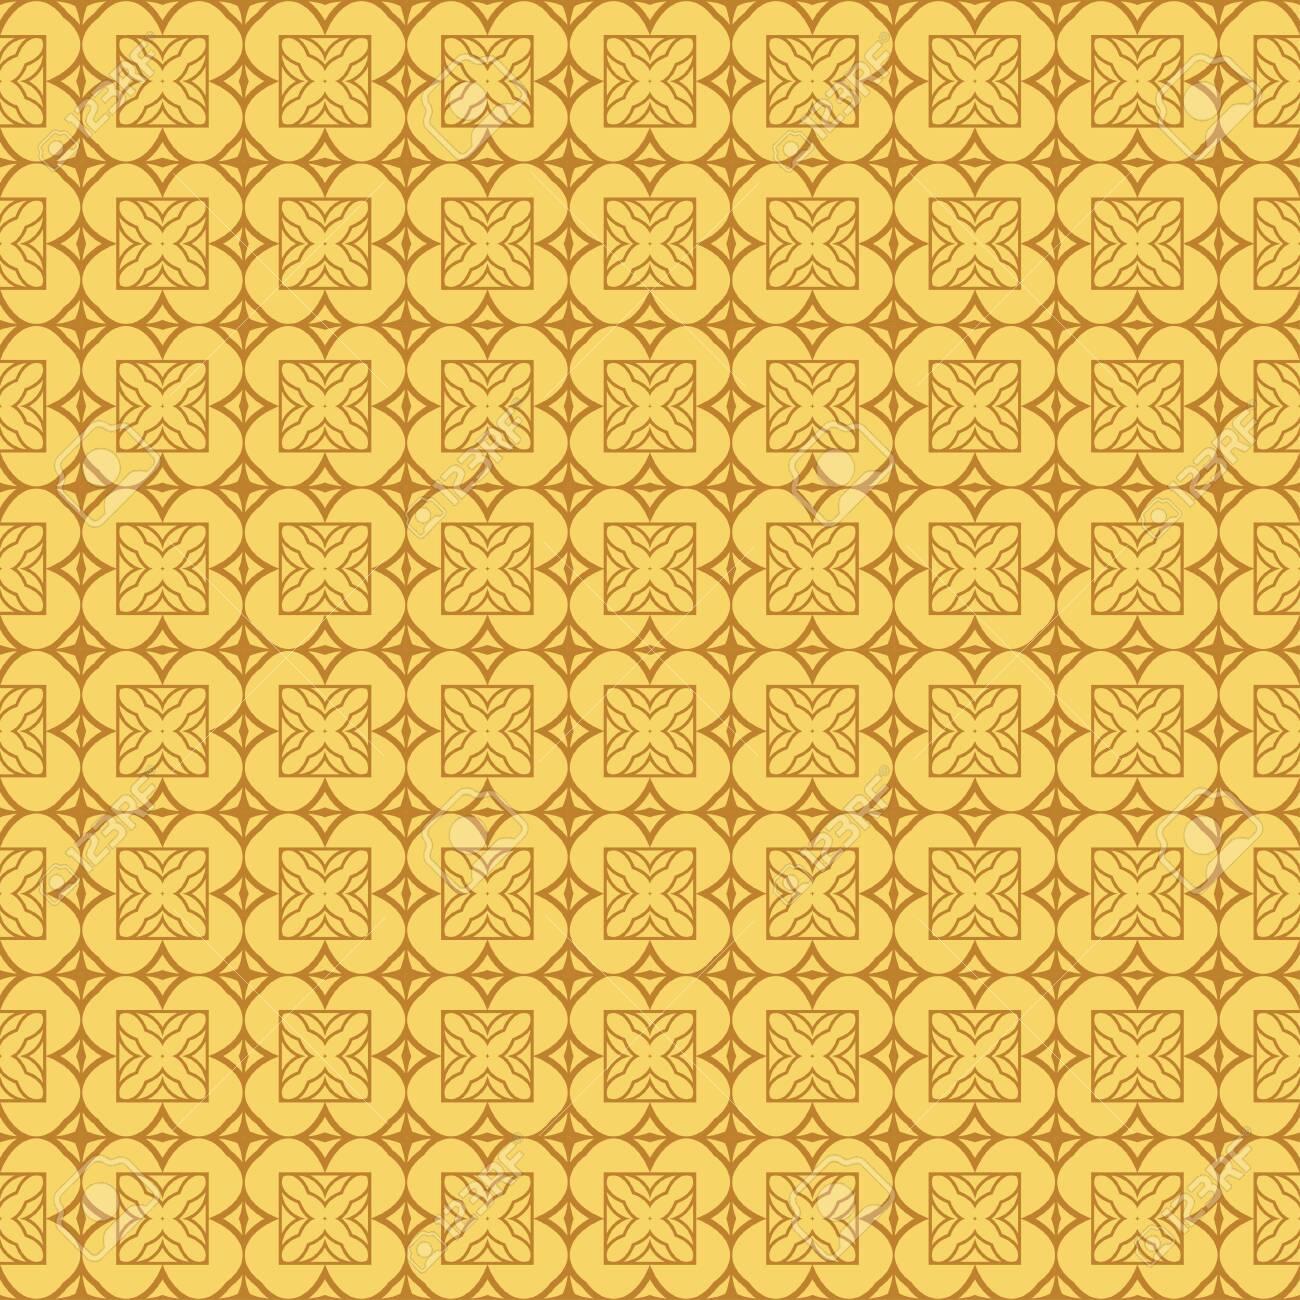 122892985 modern stylish geometry seamless pattern art deco background luxury texture for wallpaper invitation